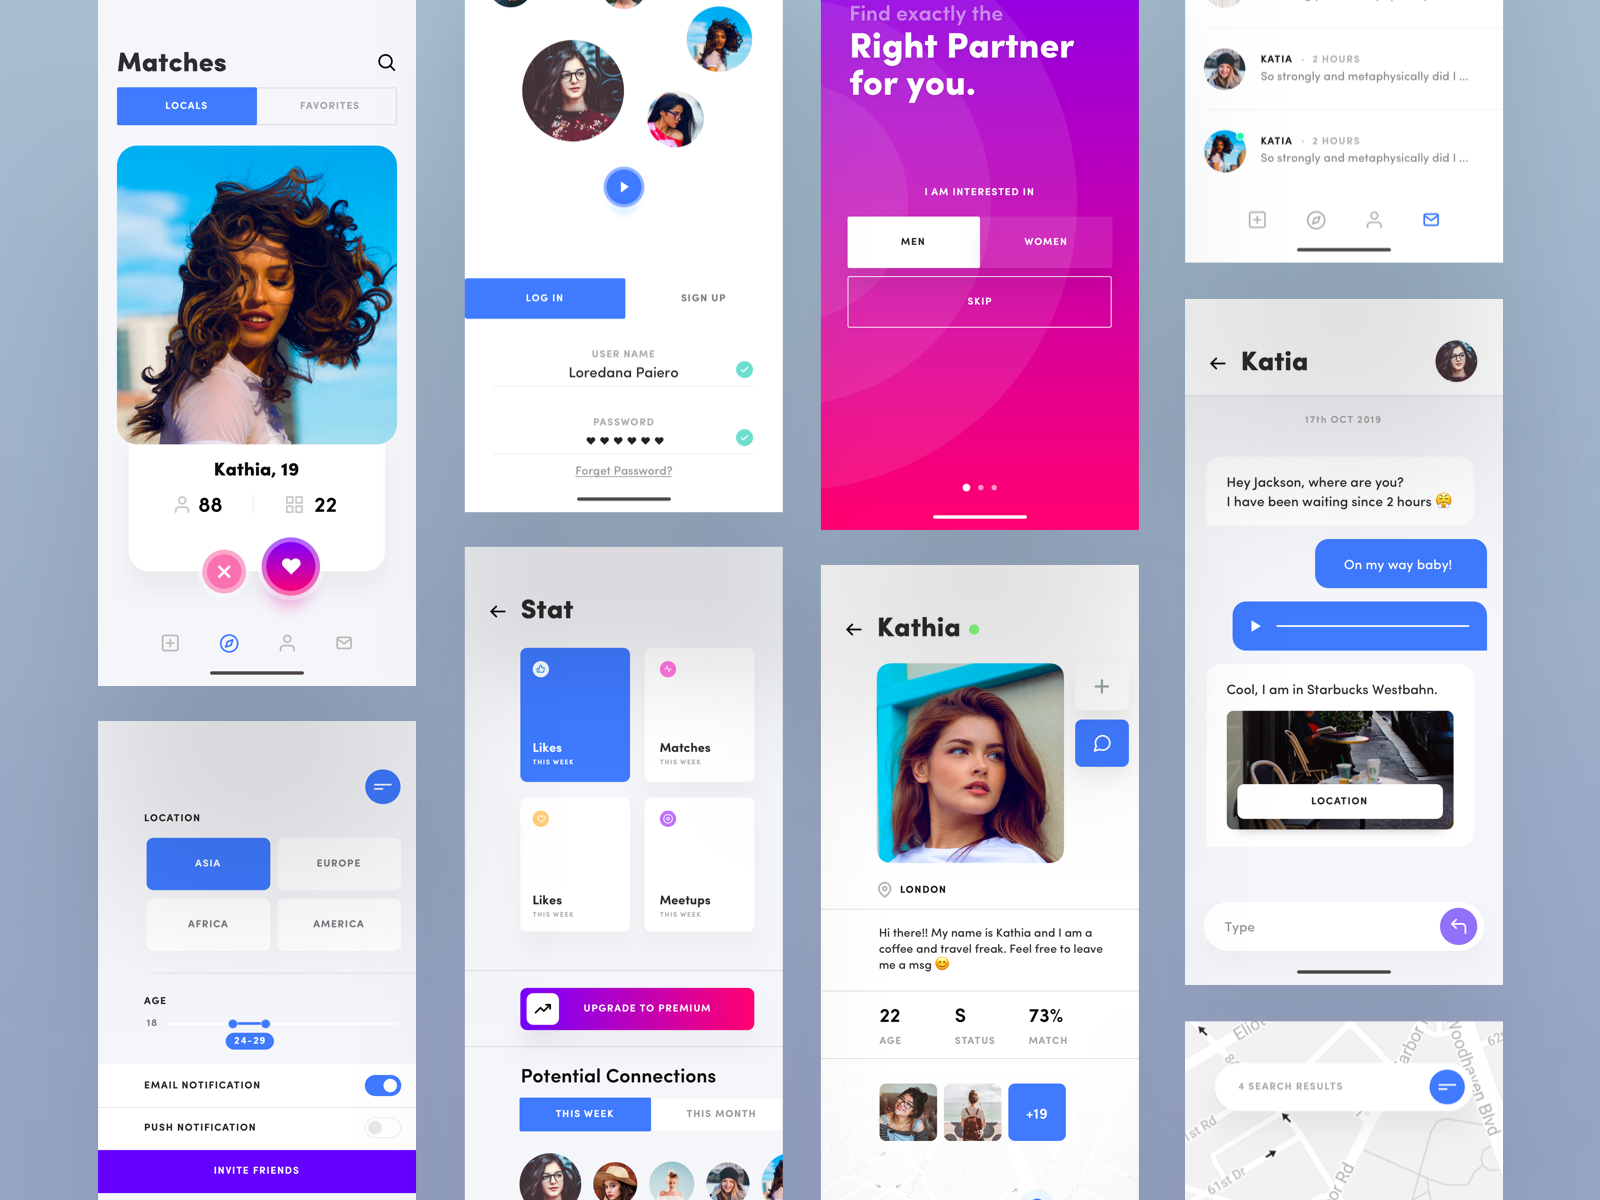 Dating App Tinder dating app, Best dating apps, Dating apps